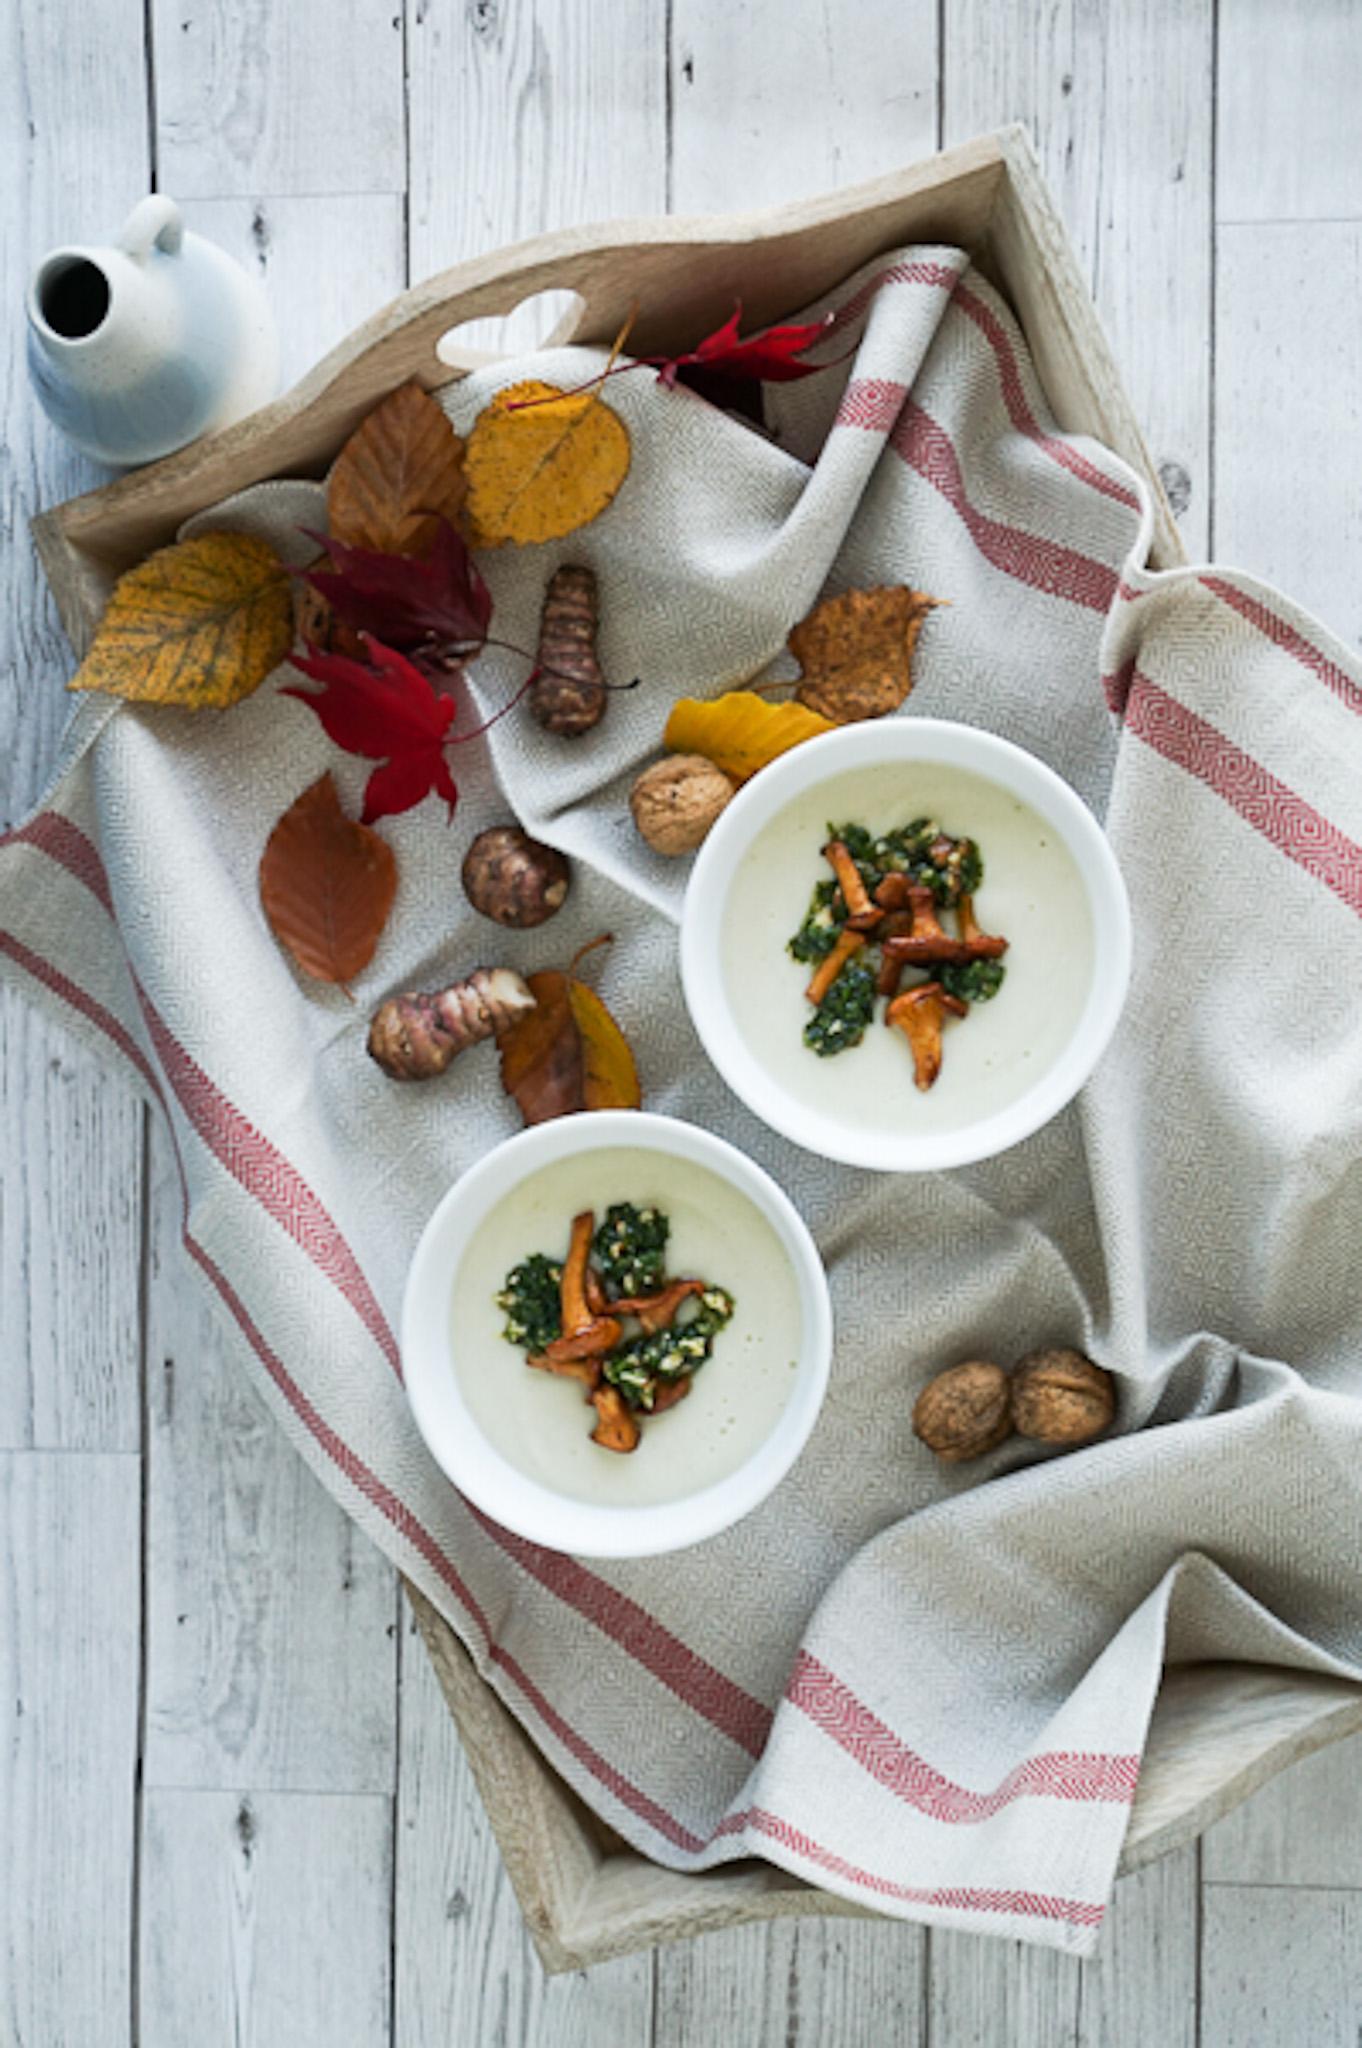 Jerusalem Artichoke Soup with Chanterelles, Lemon, Parsley & Walnuts